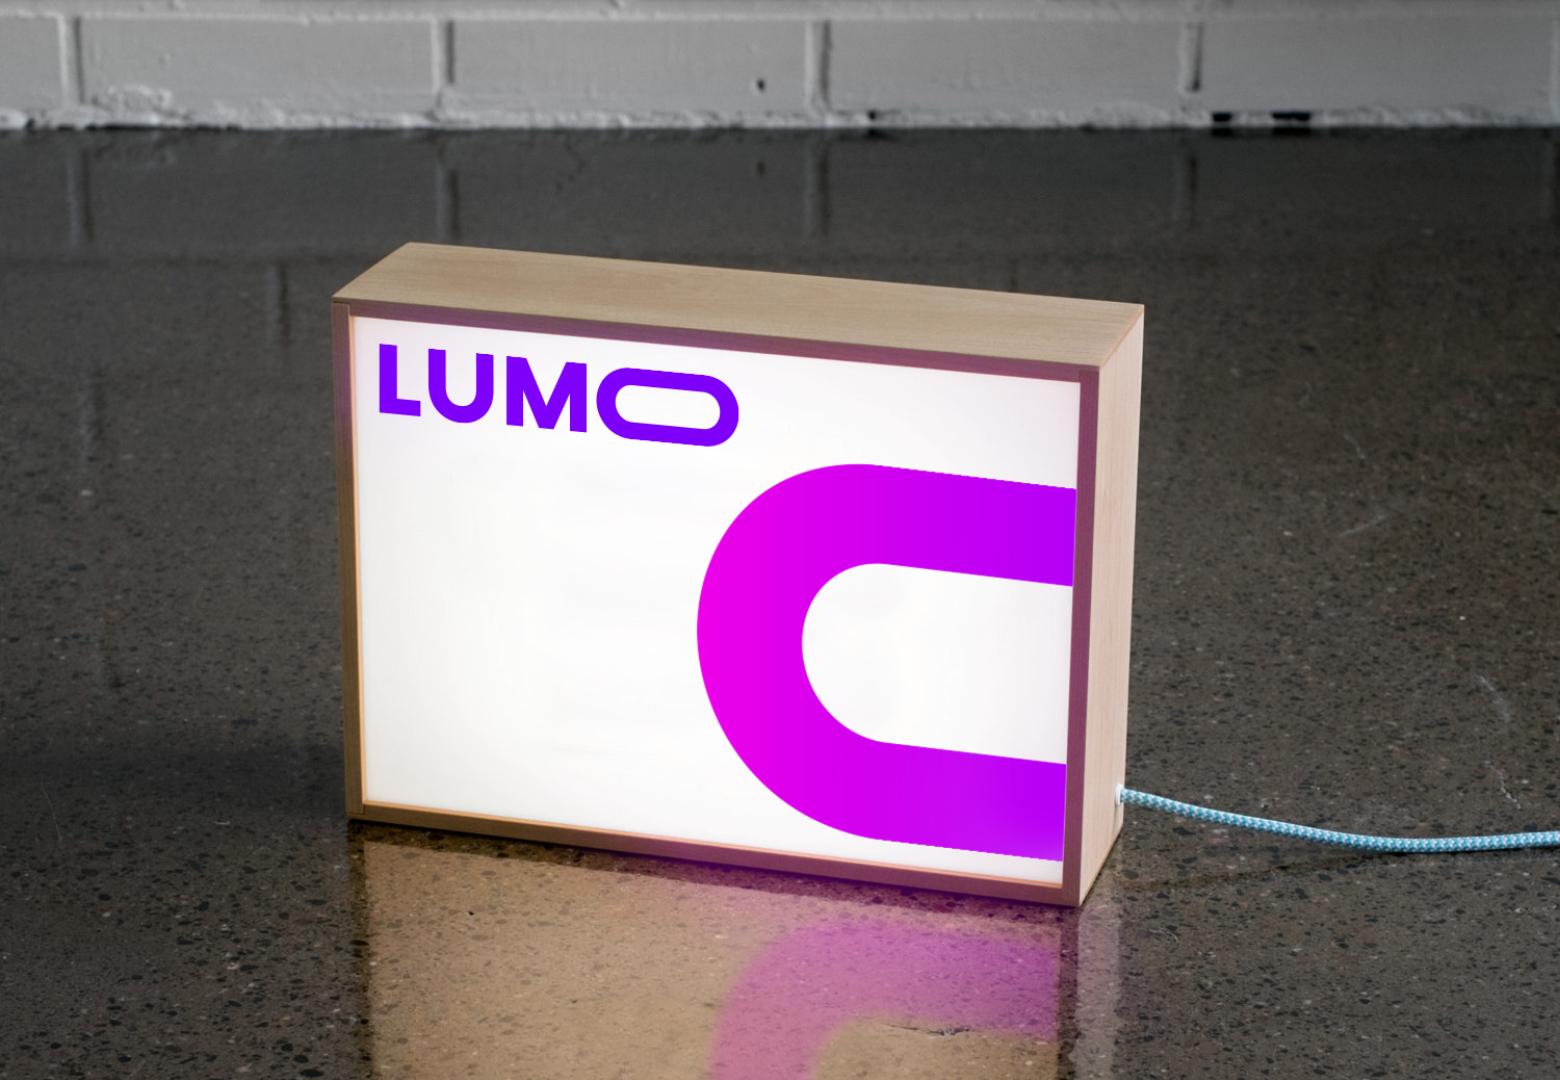 OLLIECO_Lumo-Digital-9_1560x1080